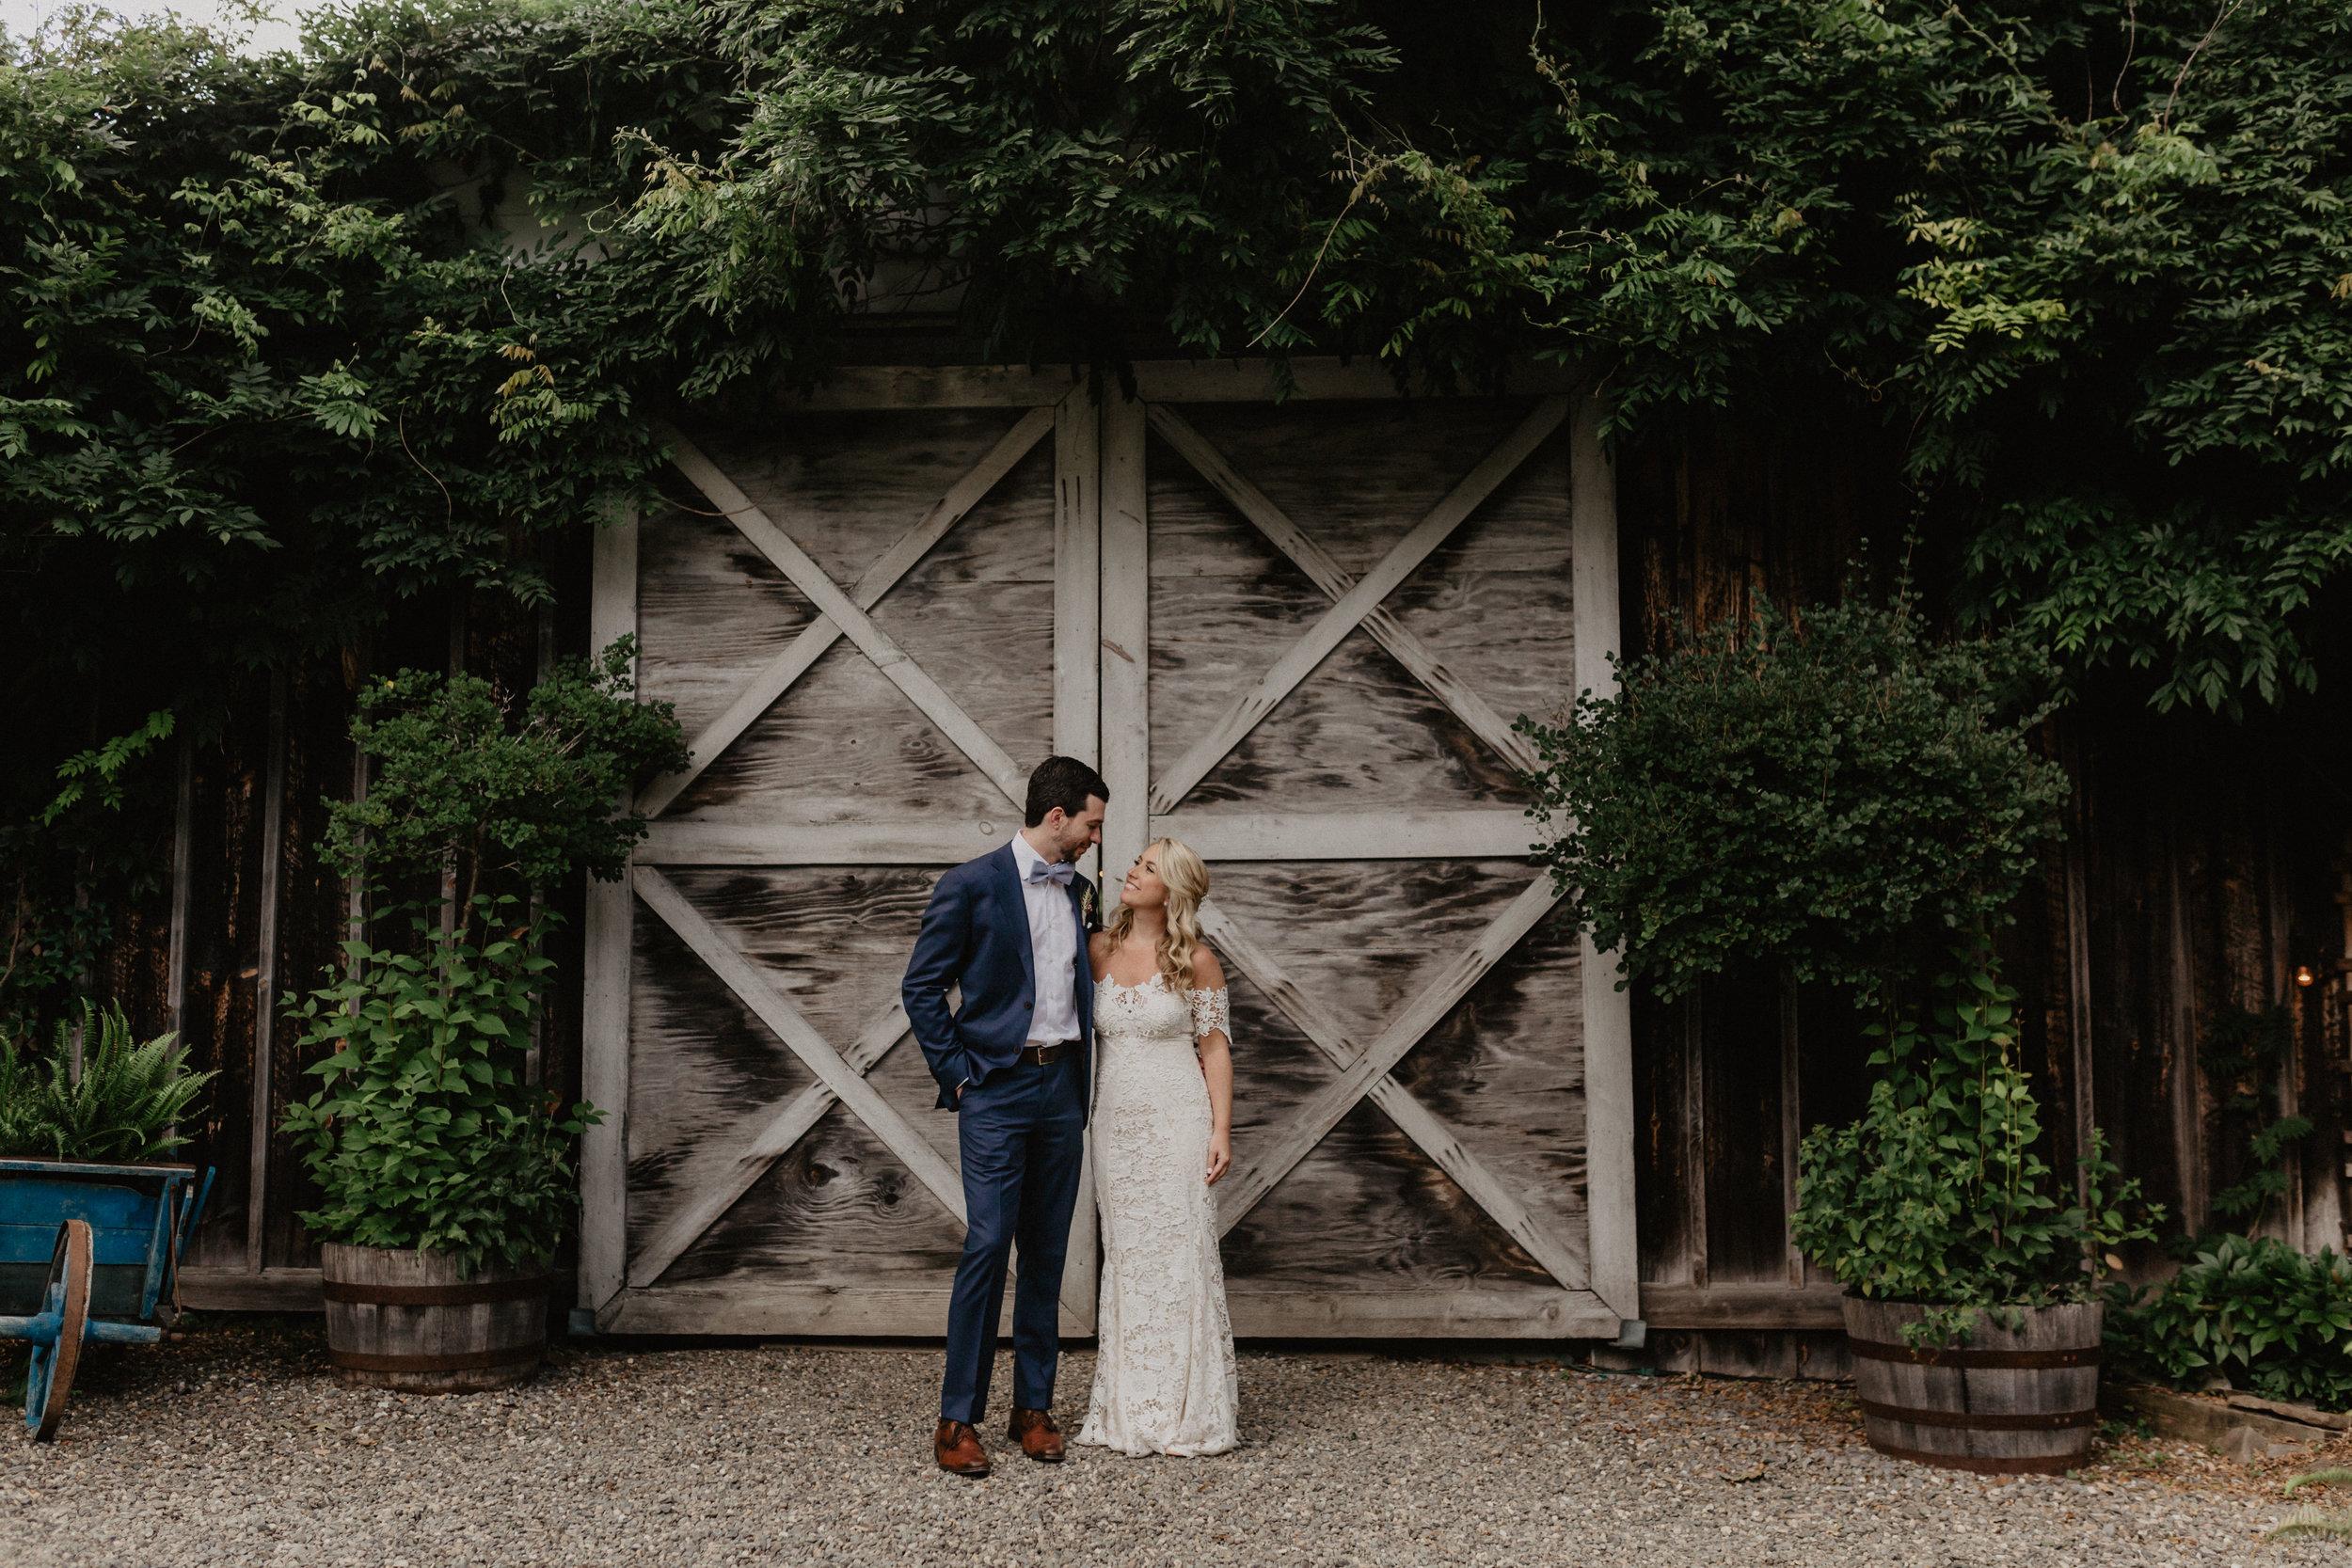 m-and-d-farm-wedding-93.jpg